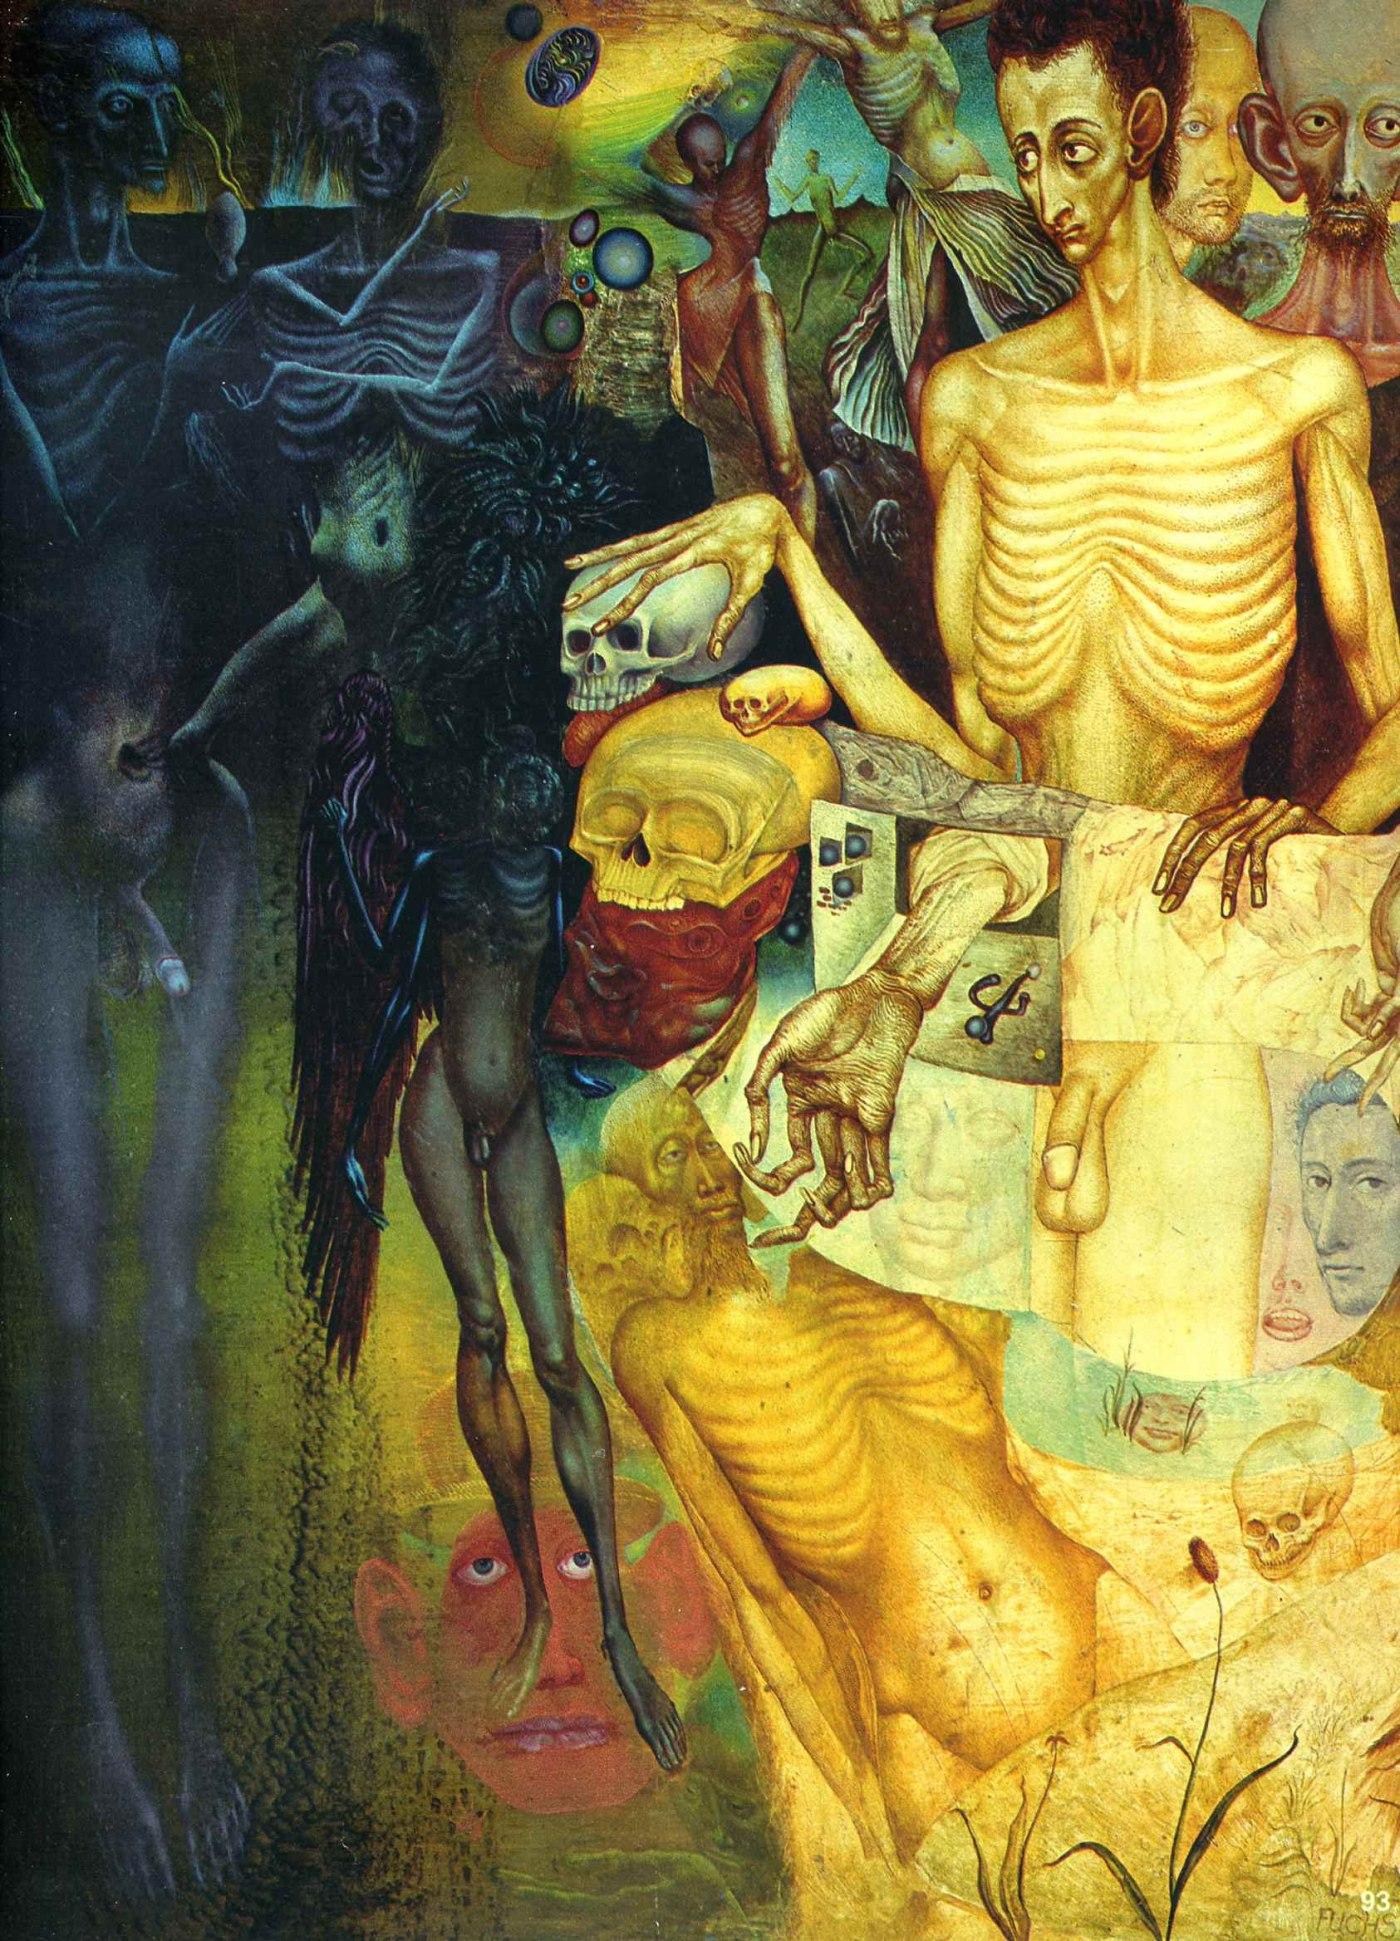 Transformations-of-Flesh-by-Ernst-Fuchs